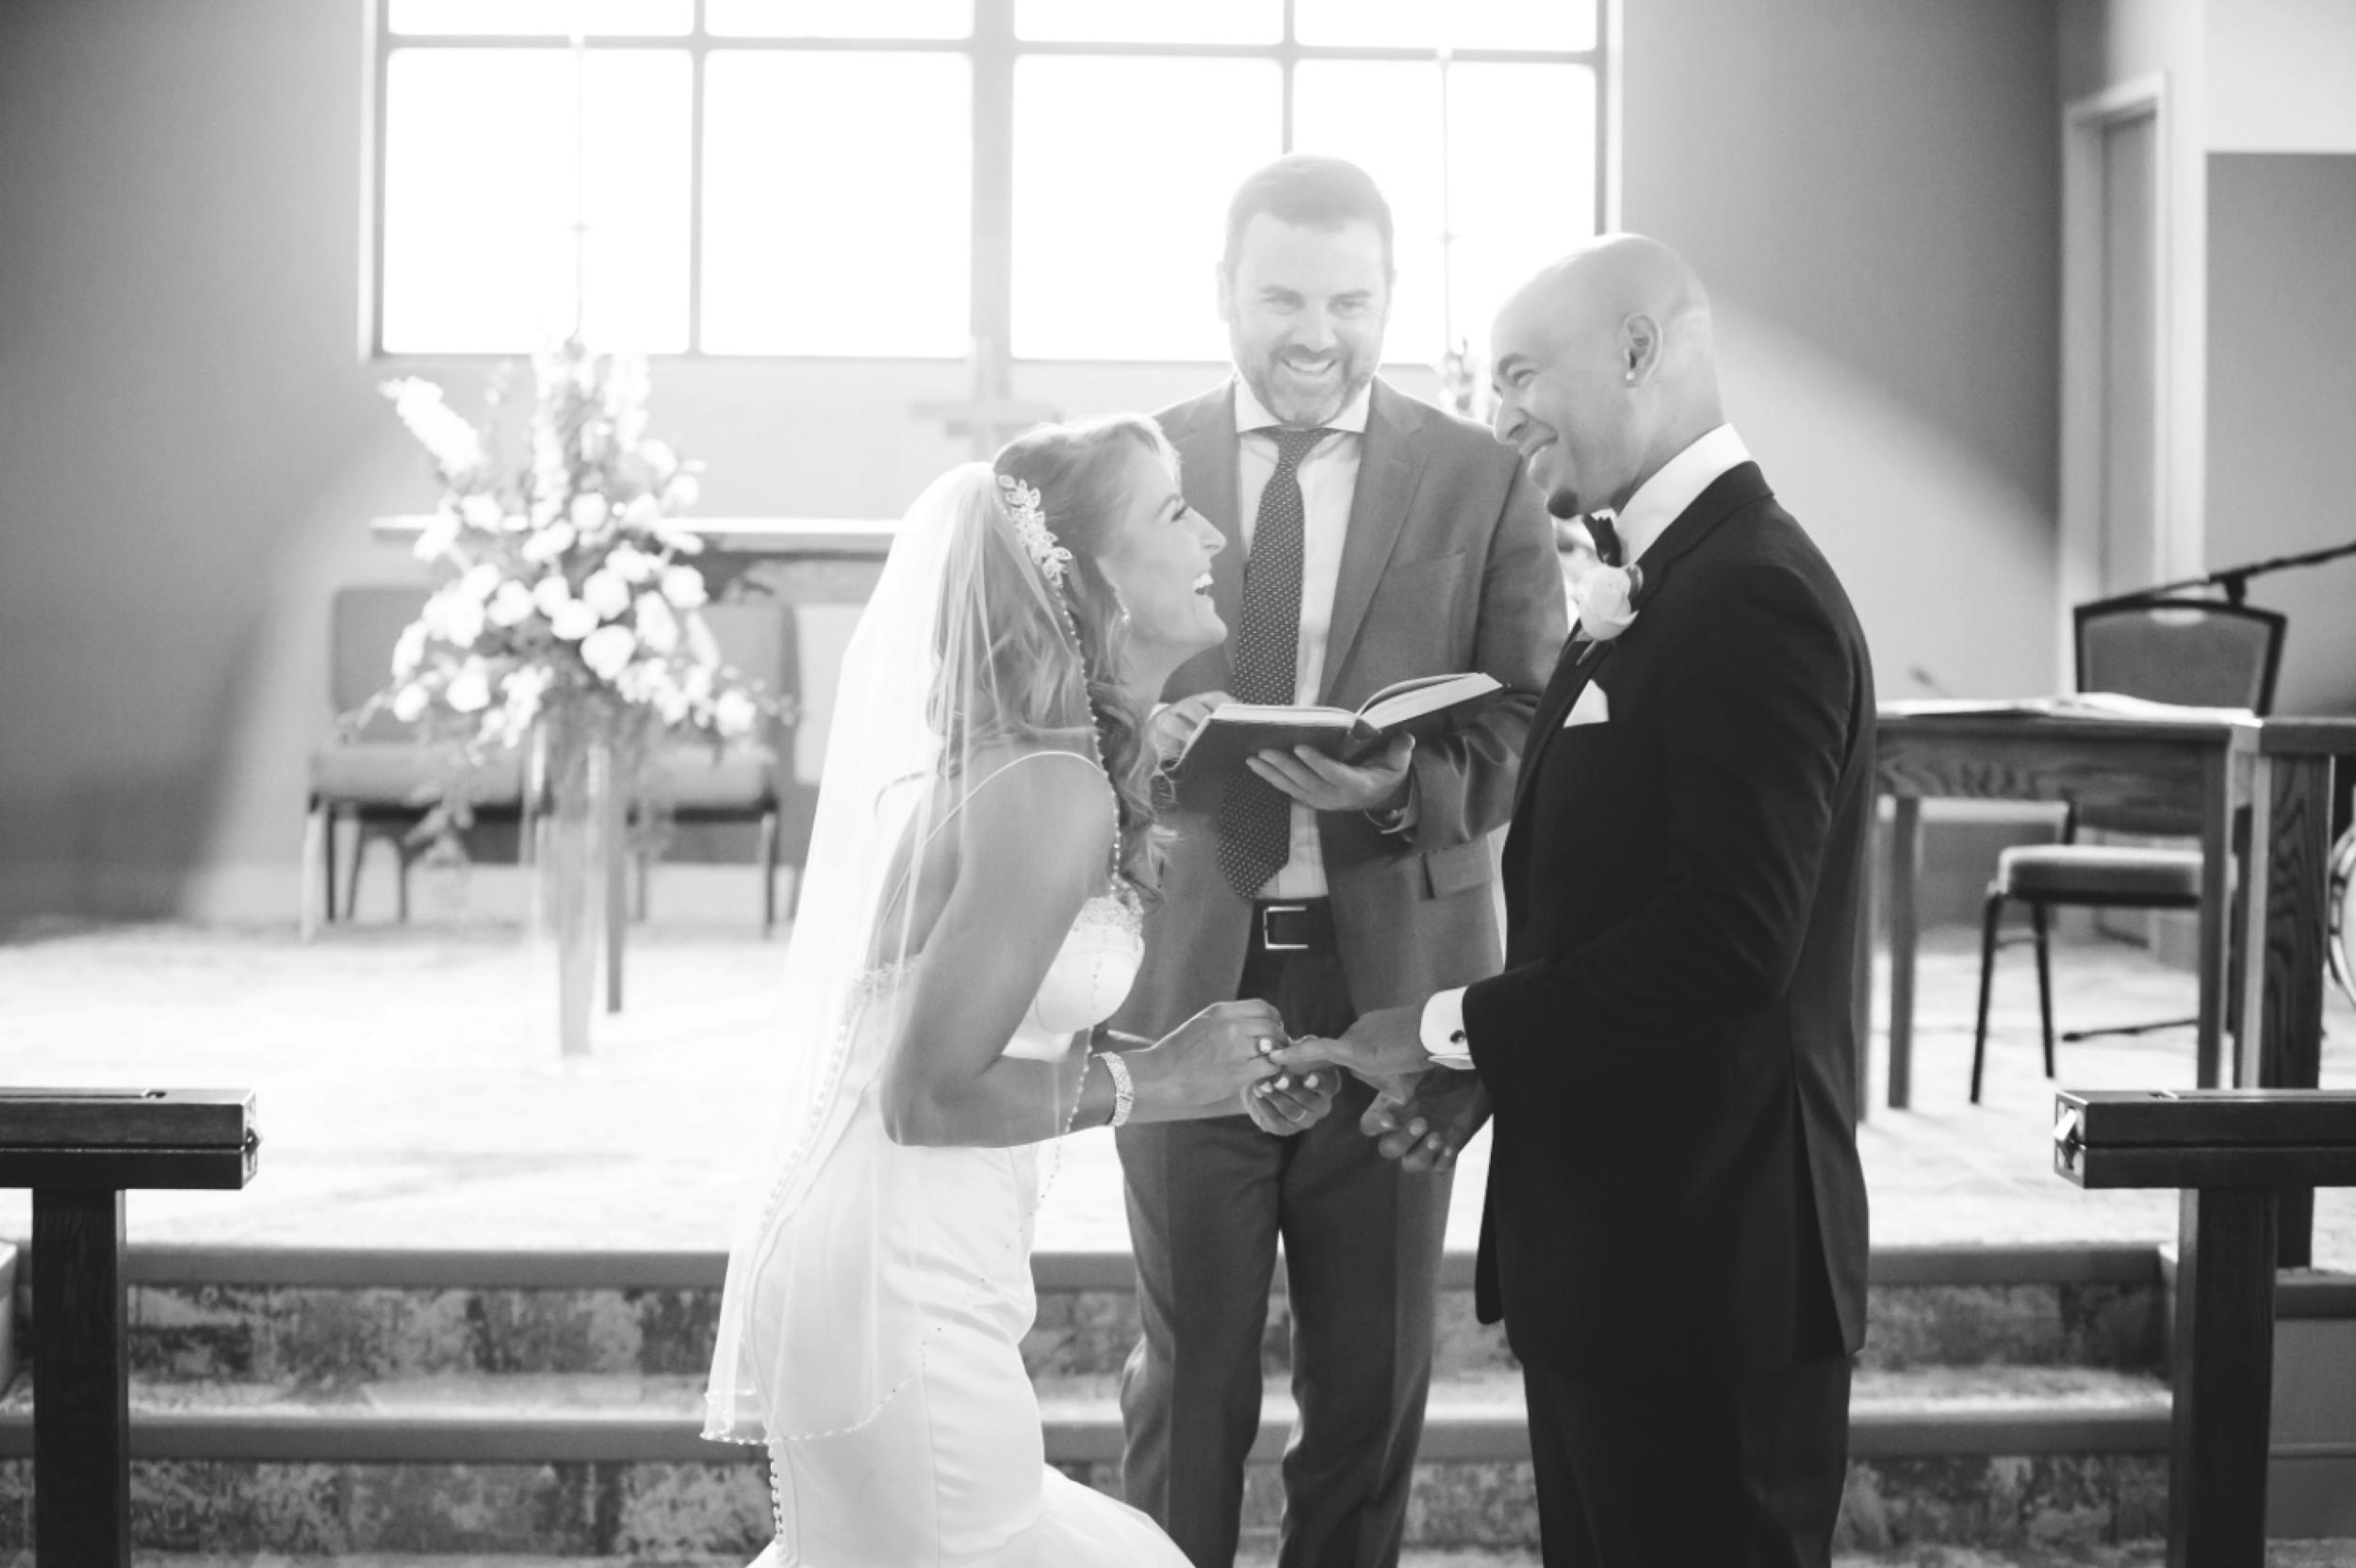 Wedding-Burlington-Convention-Center-Burlington-Oakville-Toronto-Hamilton-Niagara-Wedding-Photographer-Photography-Moments-by-Lauren-Photo-Image-22.png